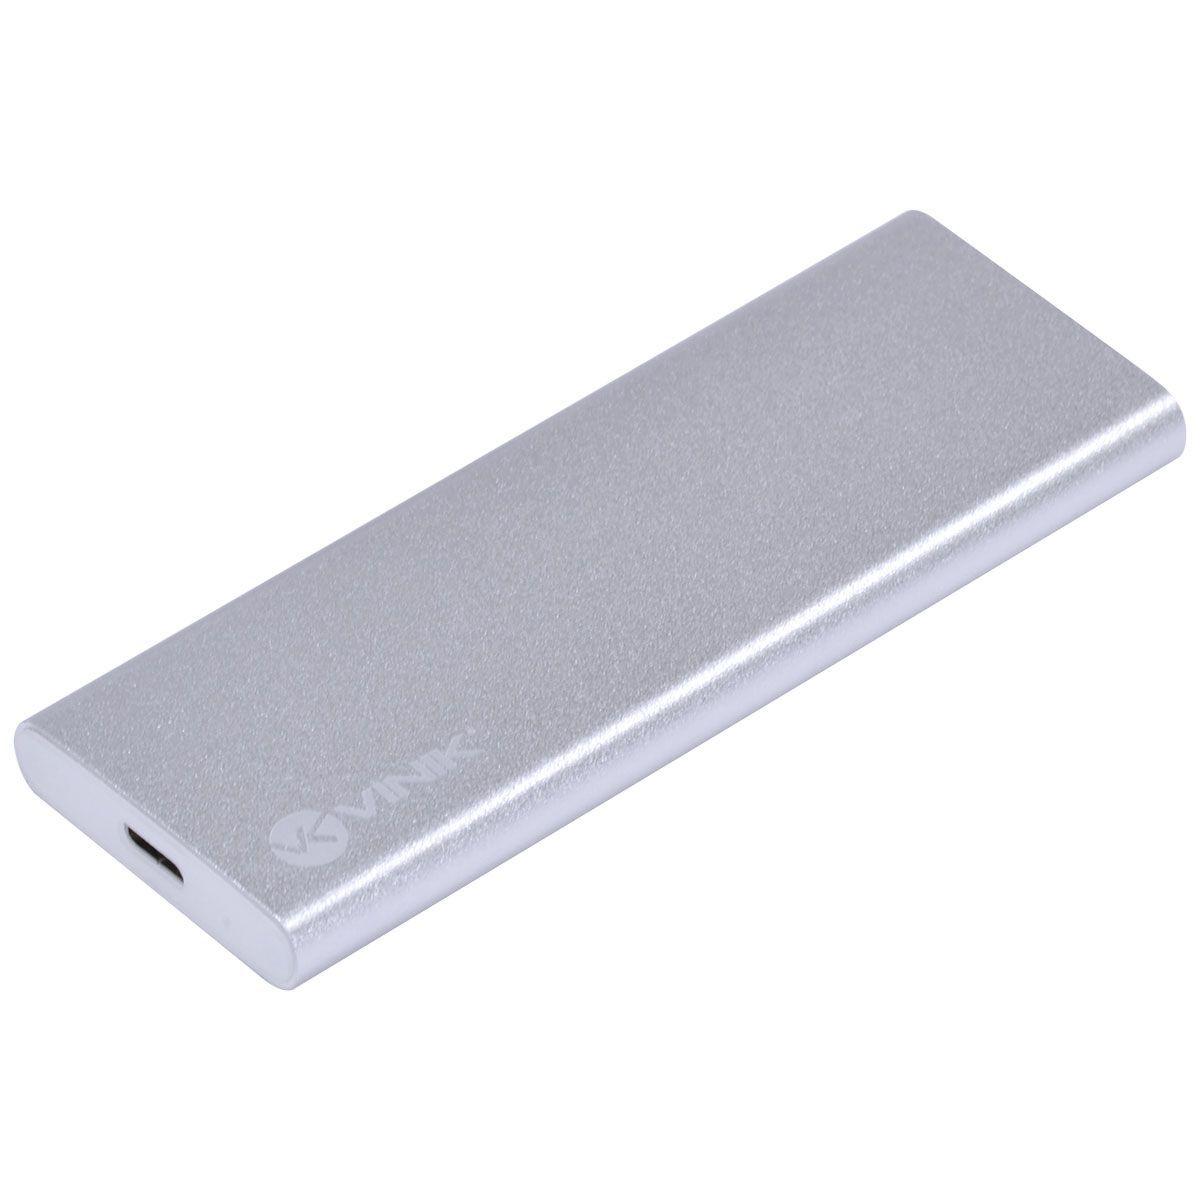 CASE EXTERNO PARA SSD M2 CONEXÃO USB 3.1 PARA SATA - USB TIPO C PARA USB - CS25-C31 vinik